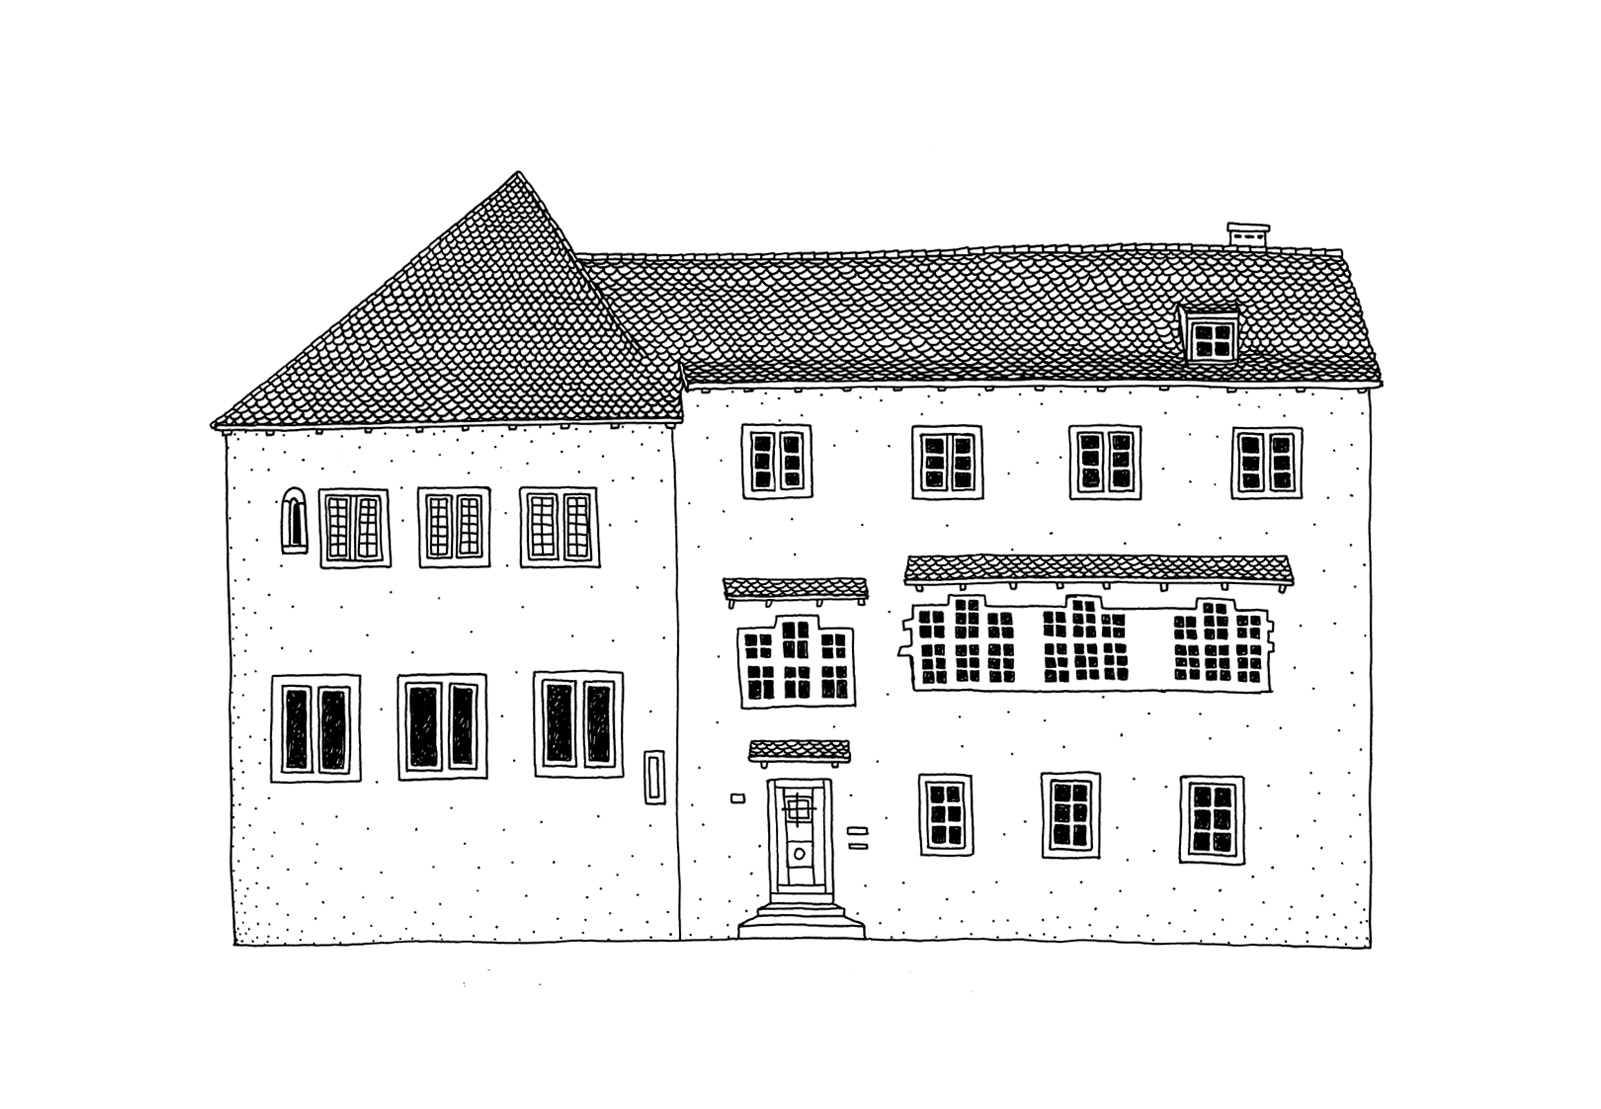 Basel Kloster Klingental